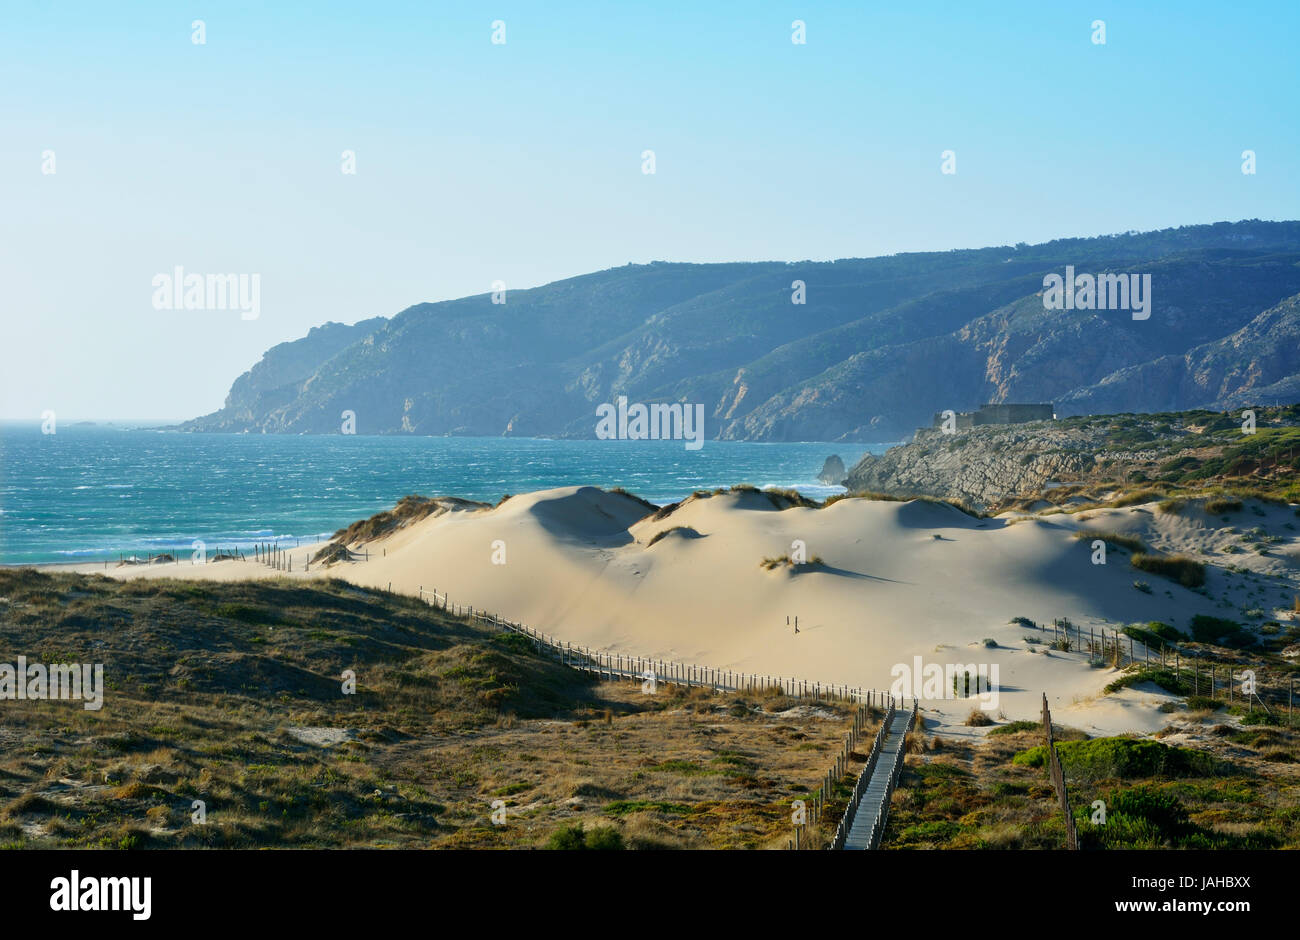 The big dunes of Guincho. Cascais, Portugal Stock Photo